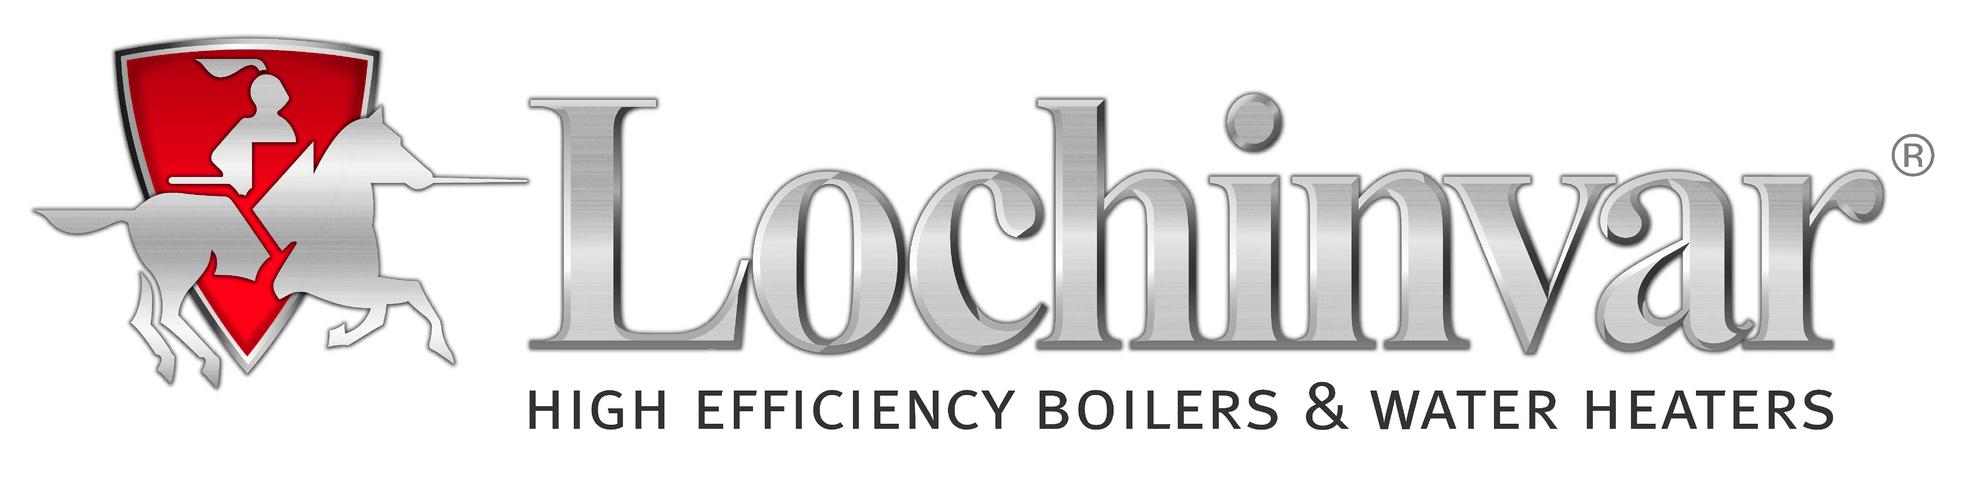 Lochinvar Ltd